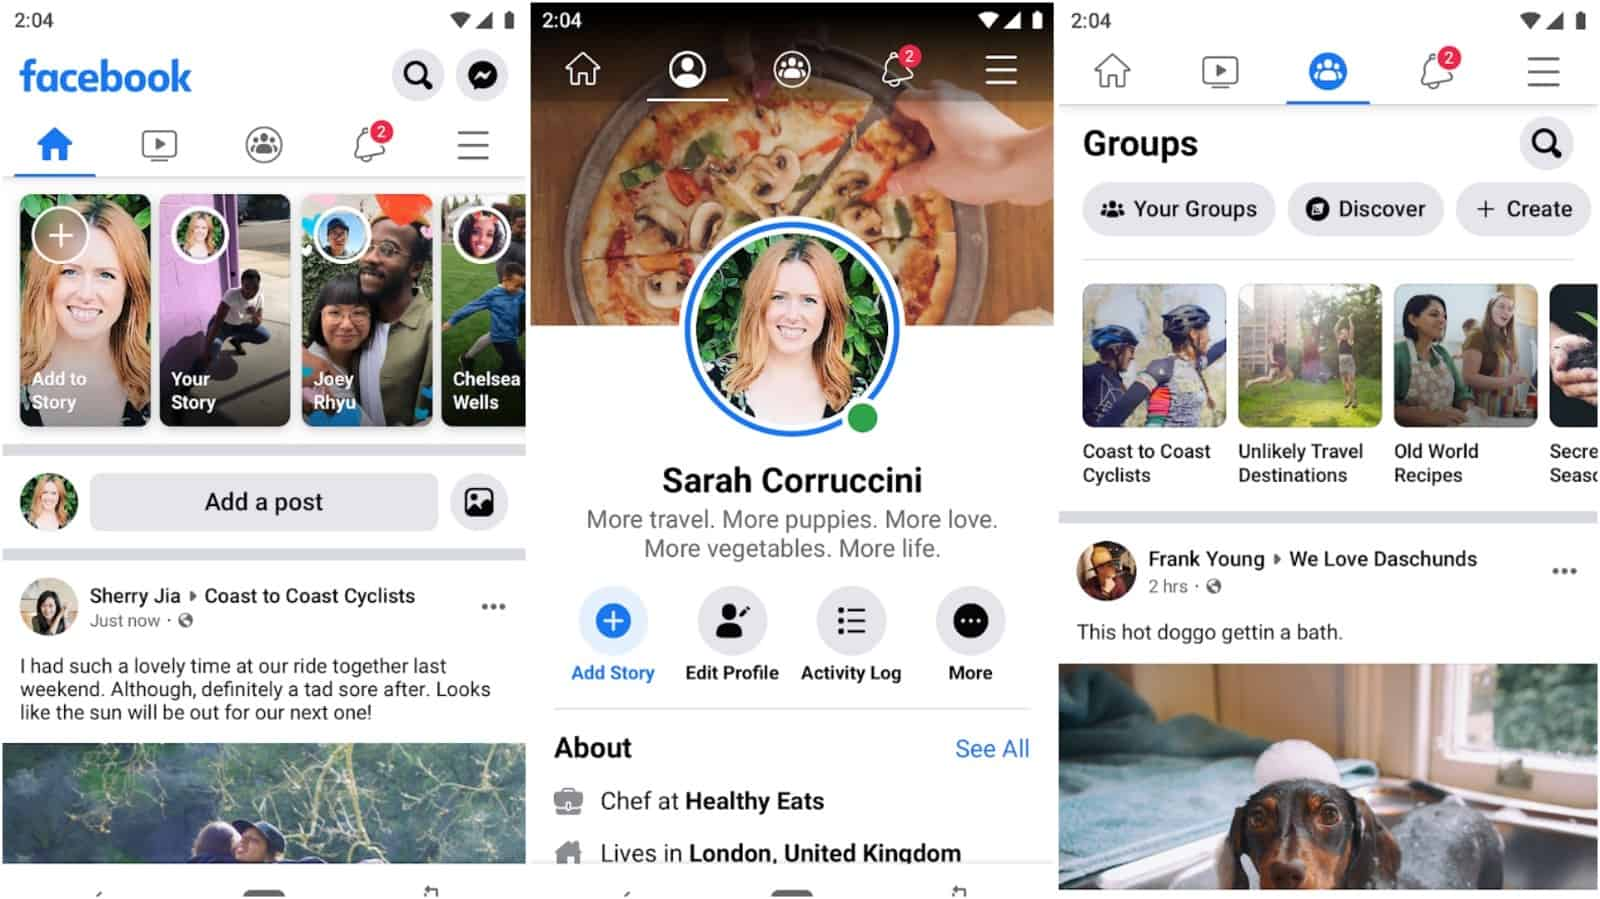 Facebook app grid image